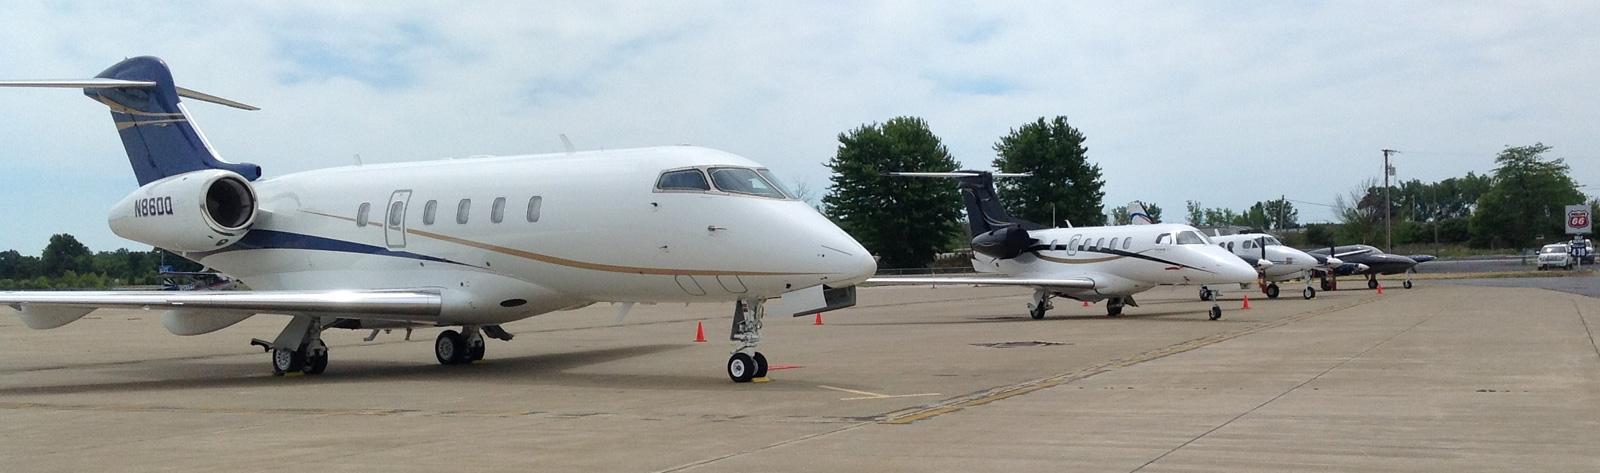 Novato Airport Transportation Limo Service